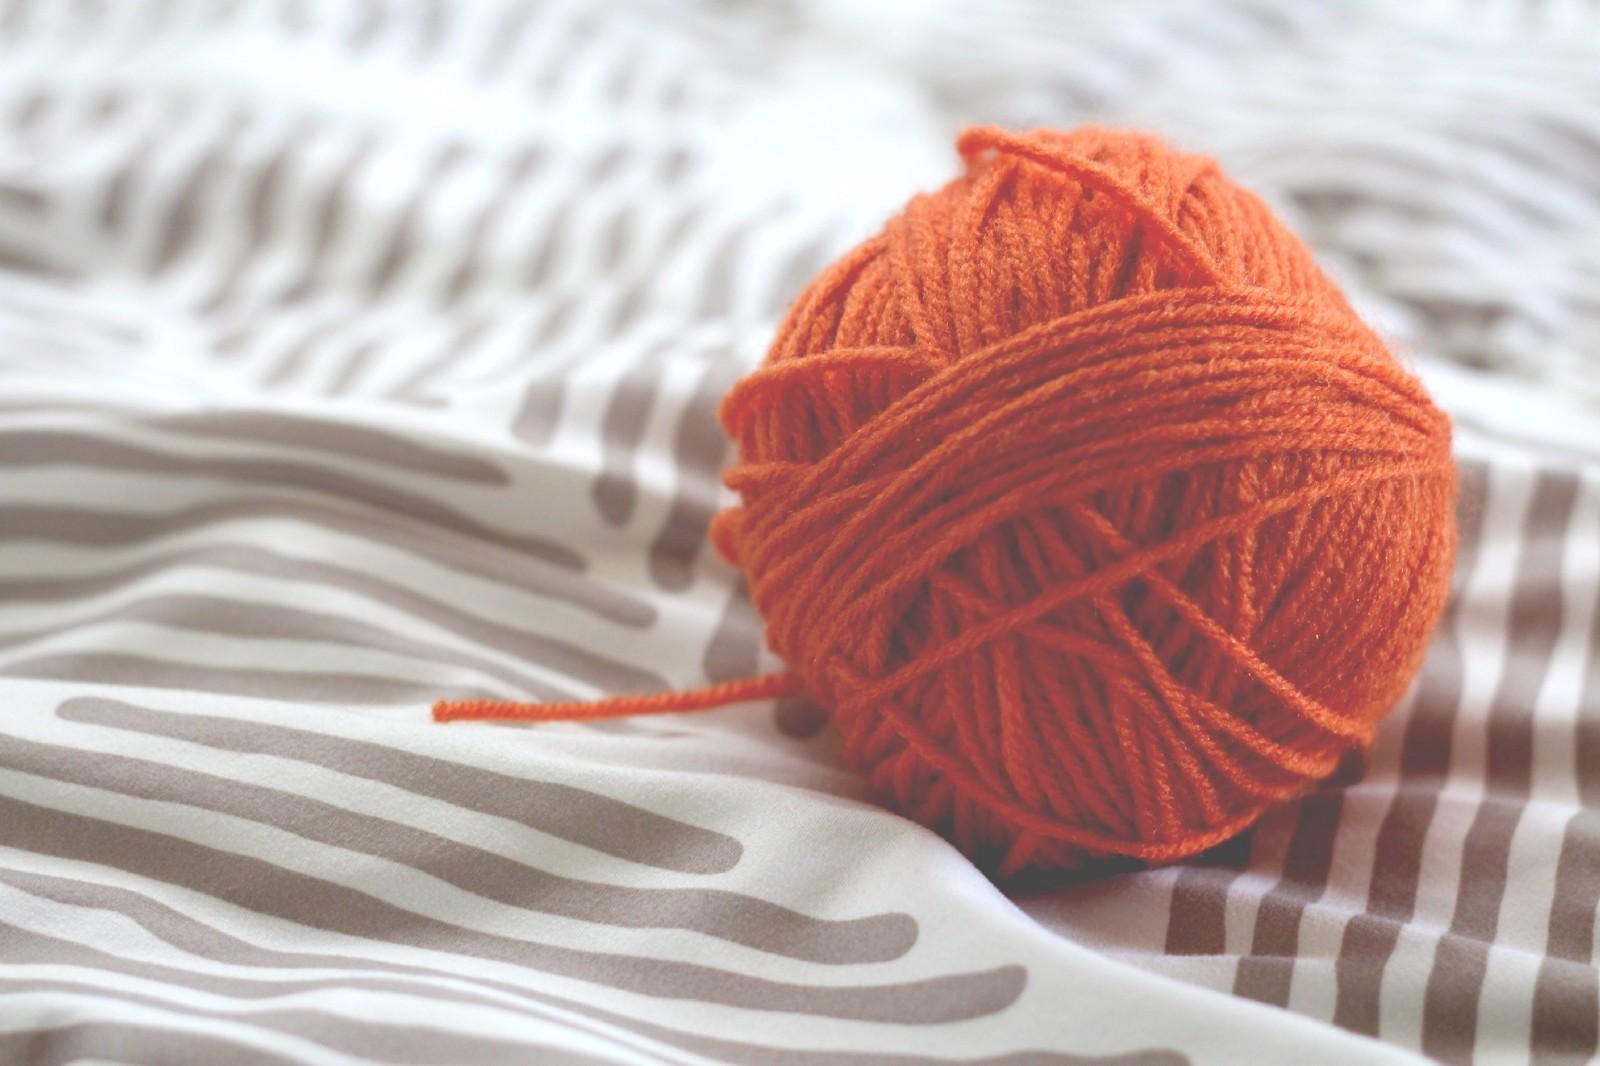 a ball of wool